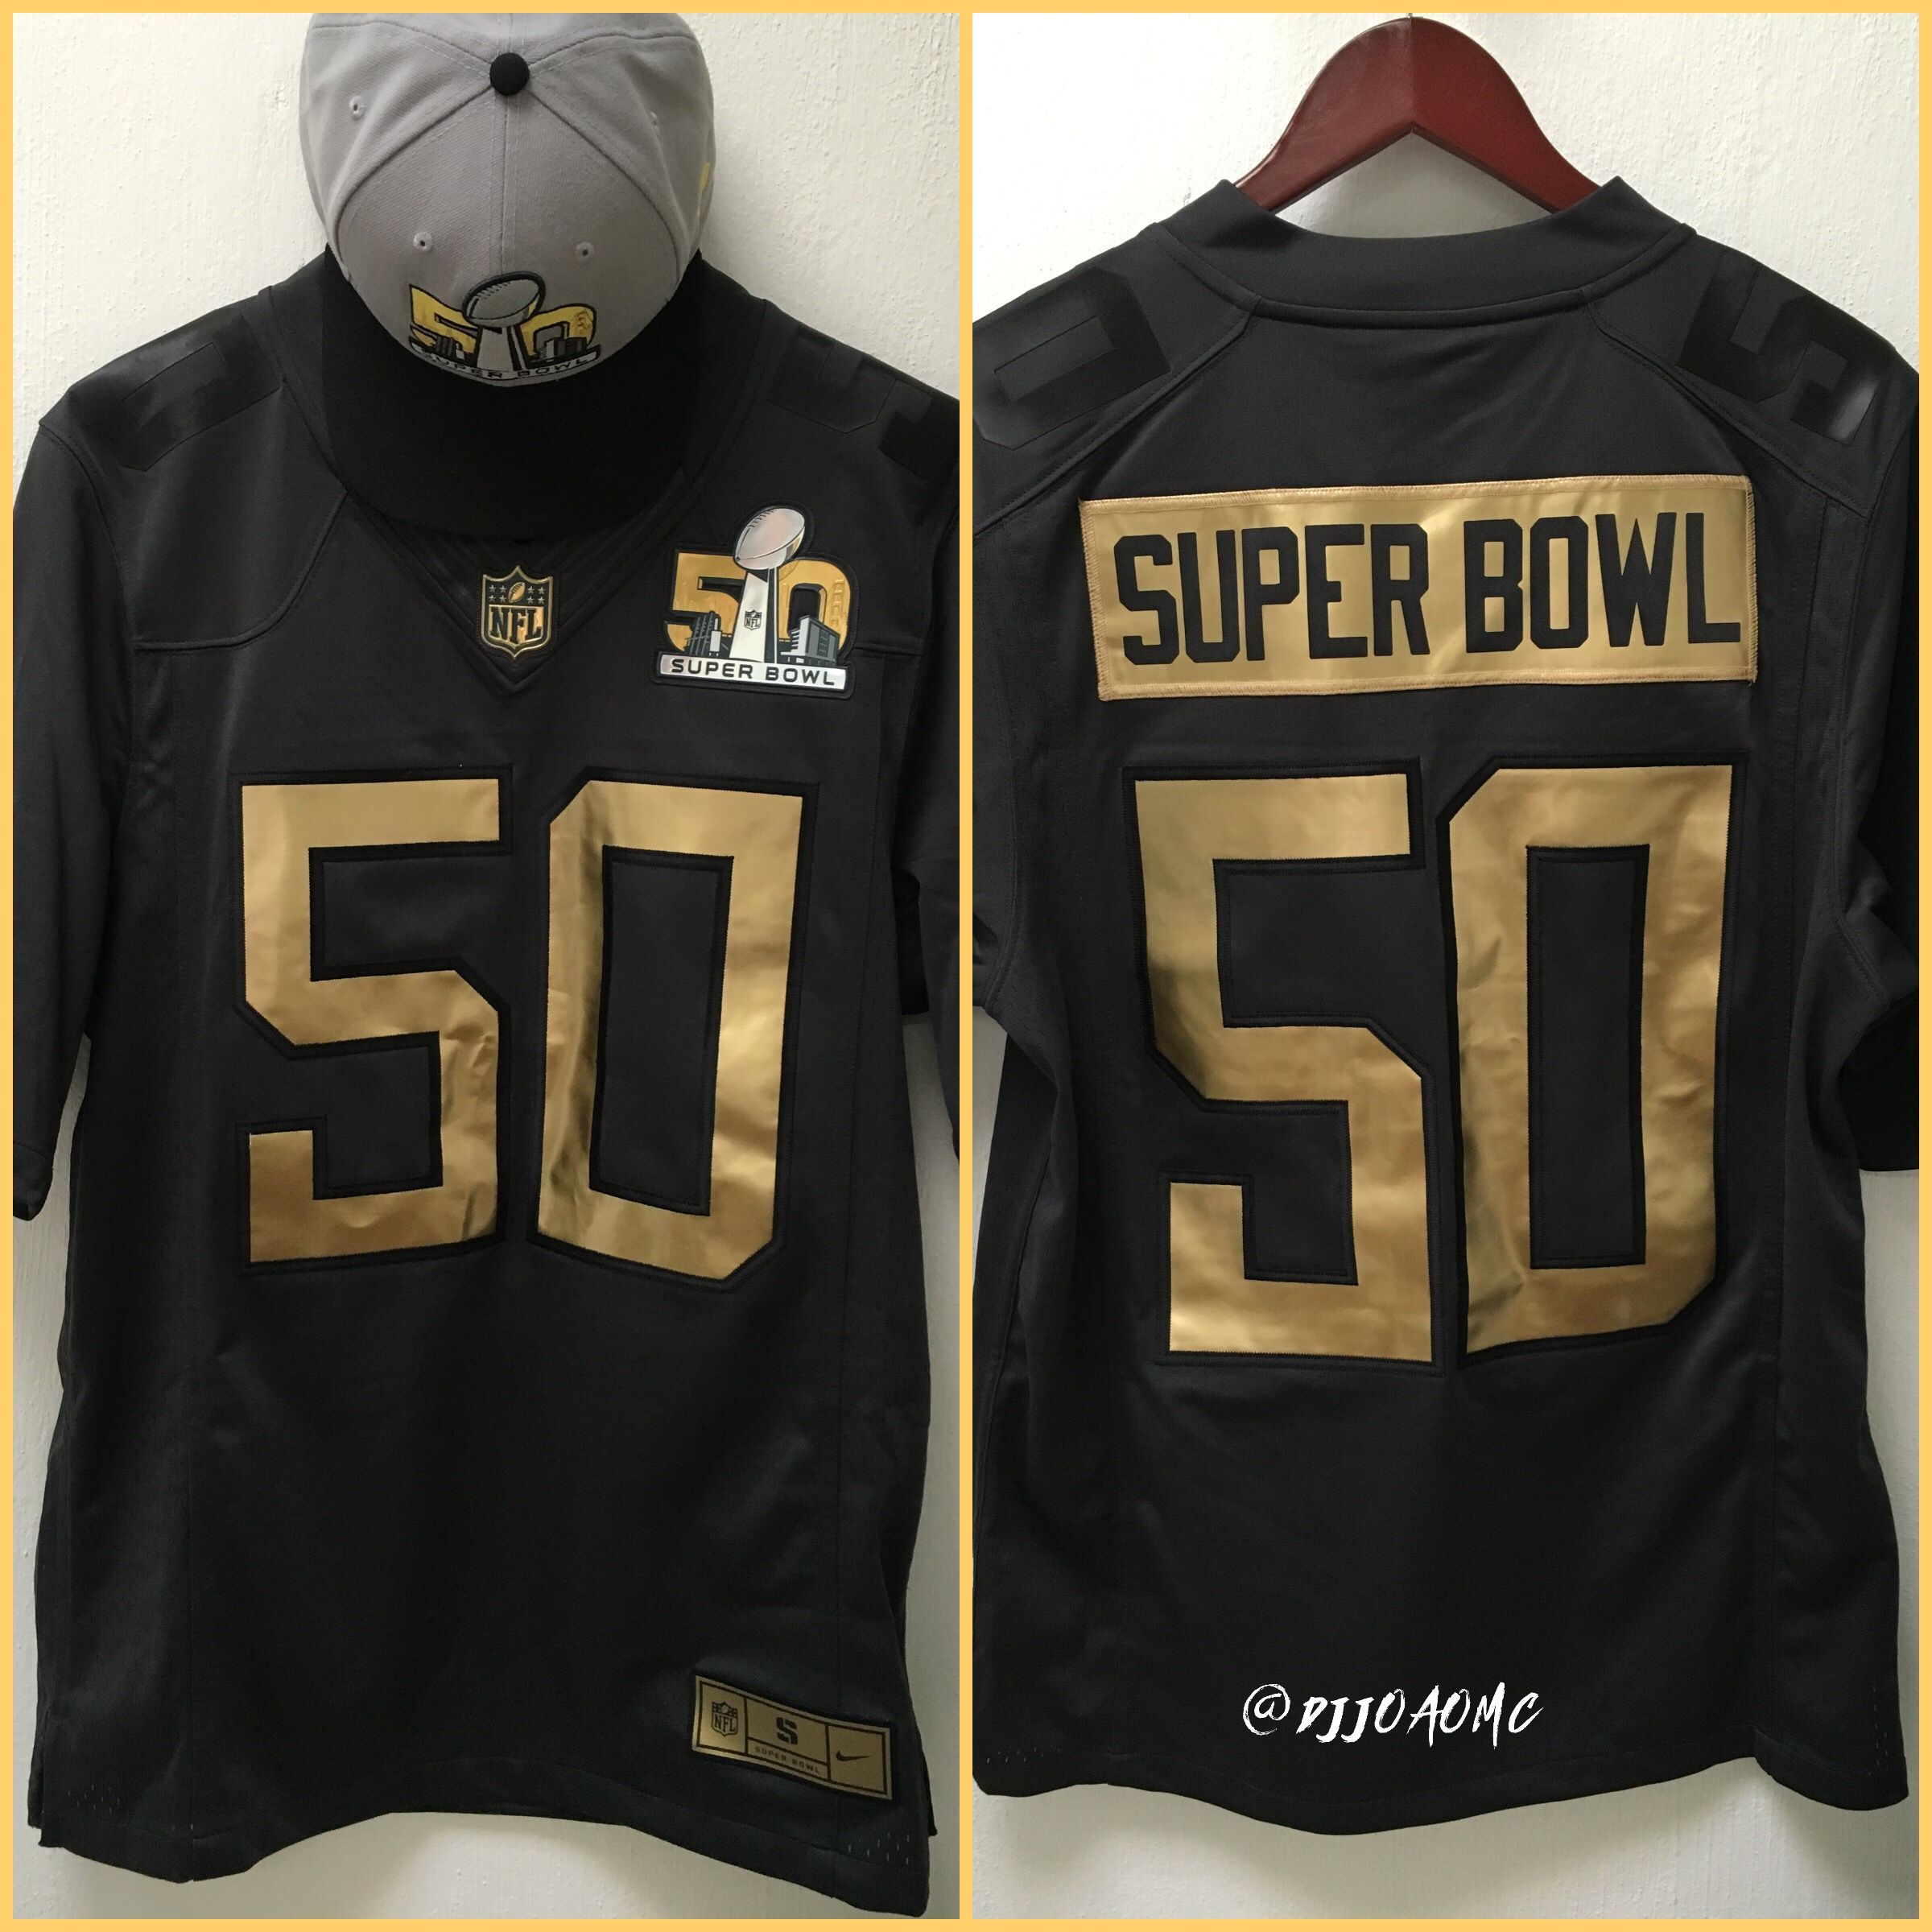 Gorras Super Bowl Xlix